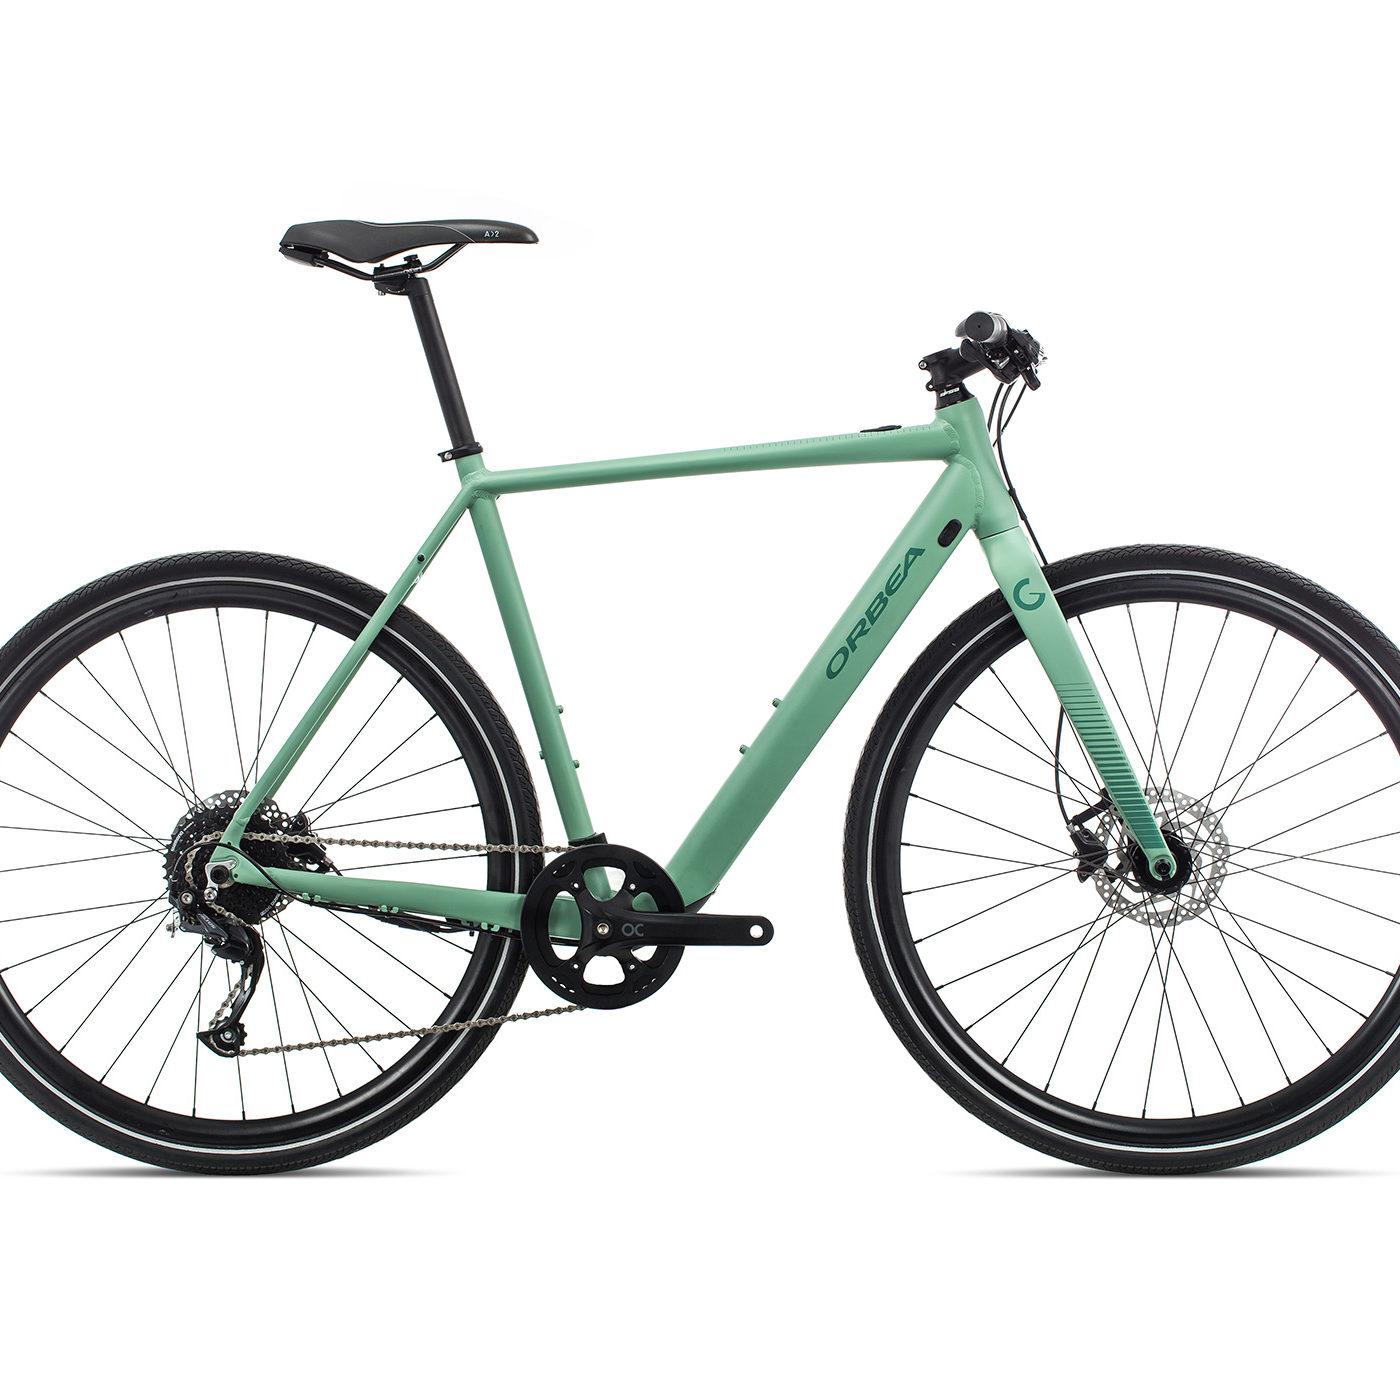 Orbea GAIN F40 - Groen (Dof-Gloss)